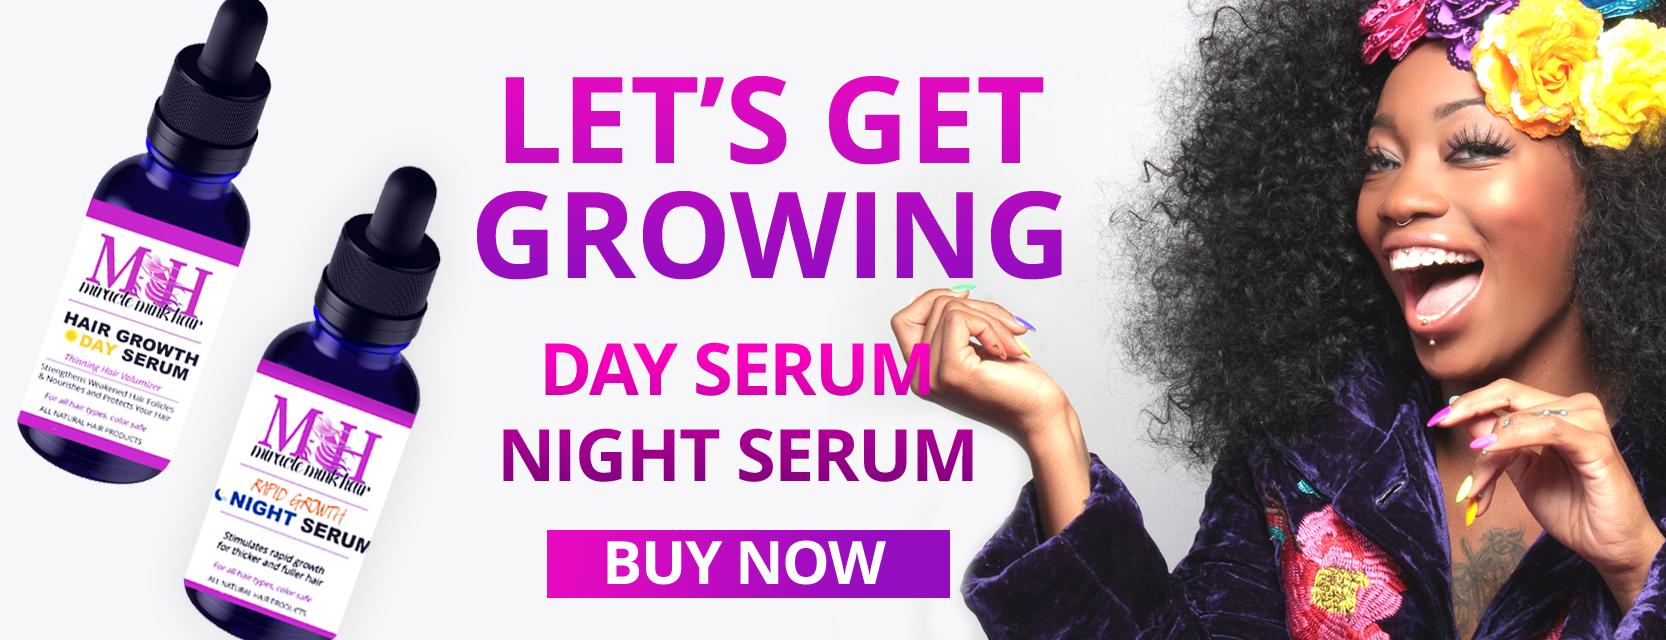 Miracle Mink Hair Growth Serum